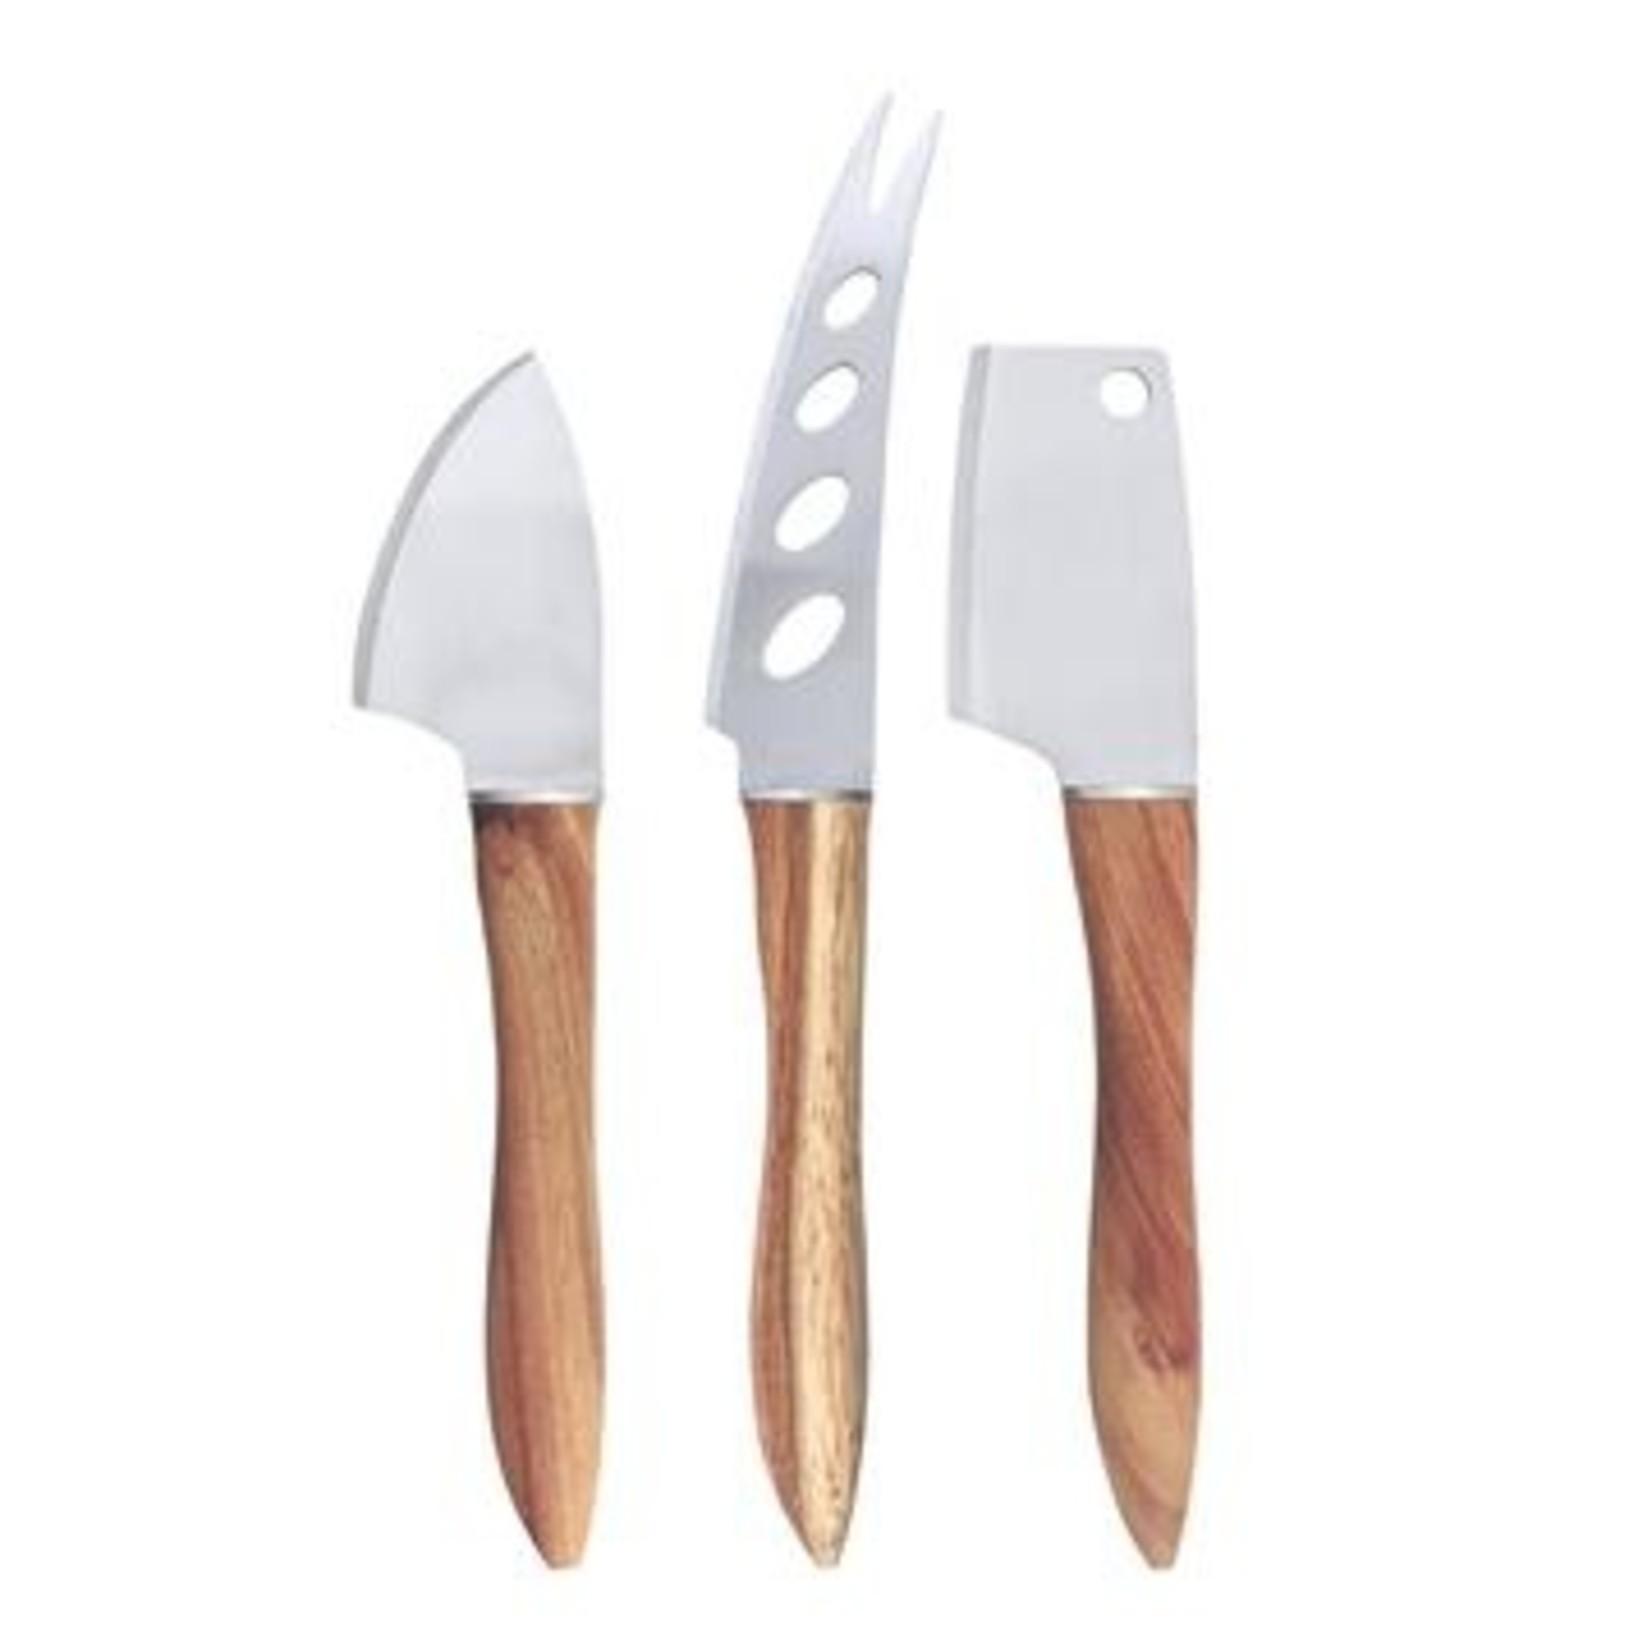 Swissmar 3 Piece Acacia Cheese Knife Set